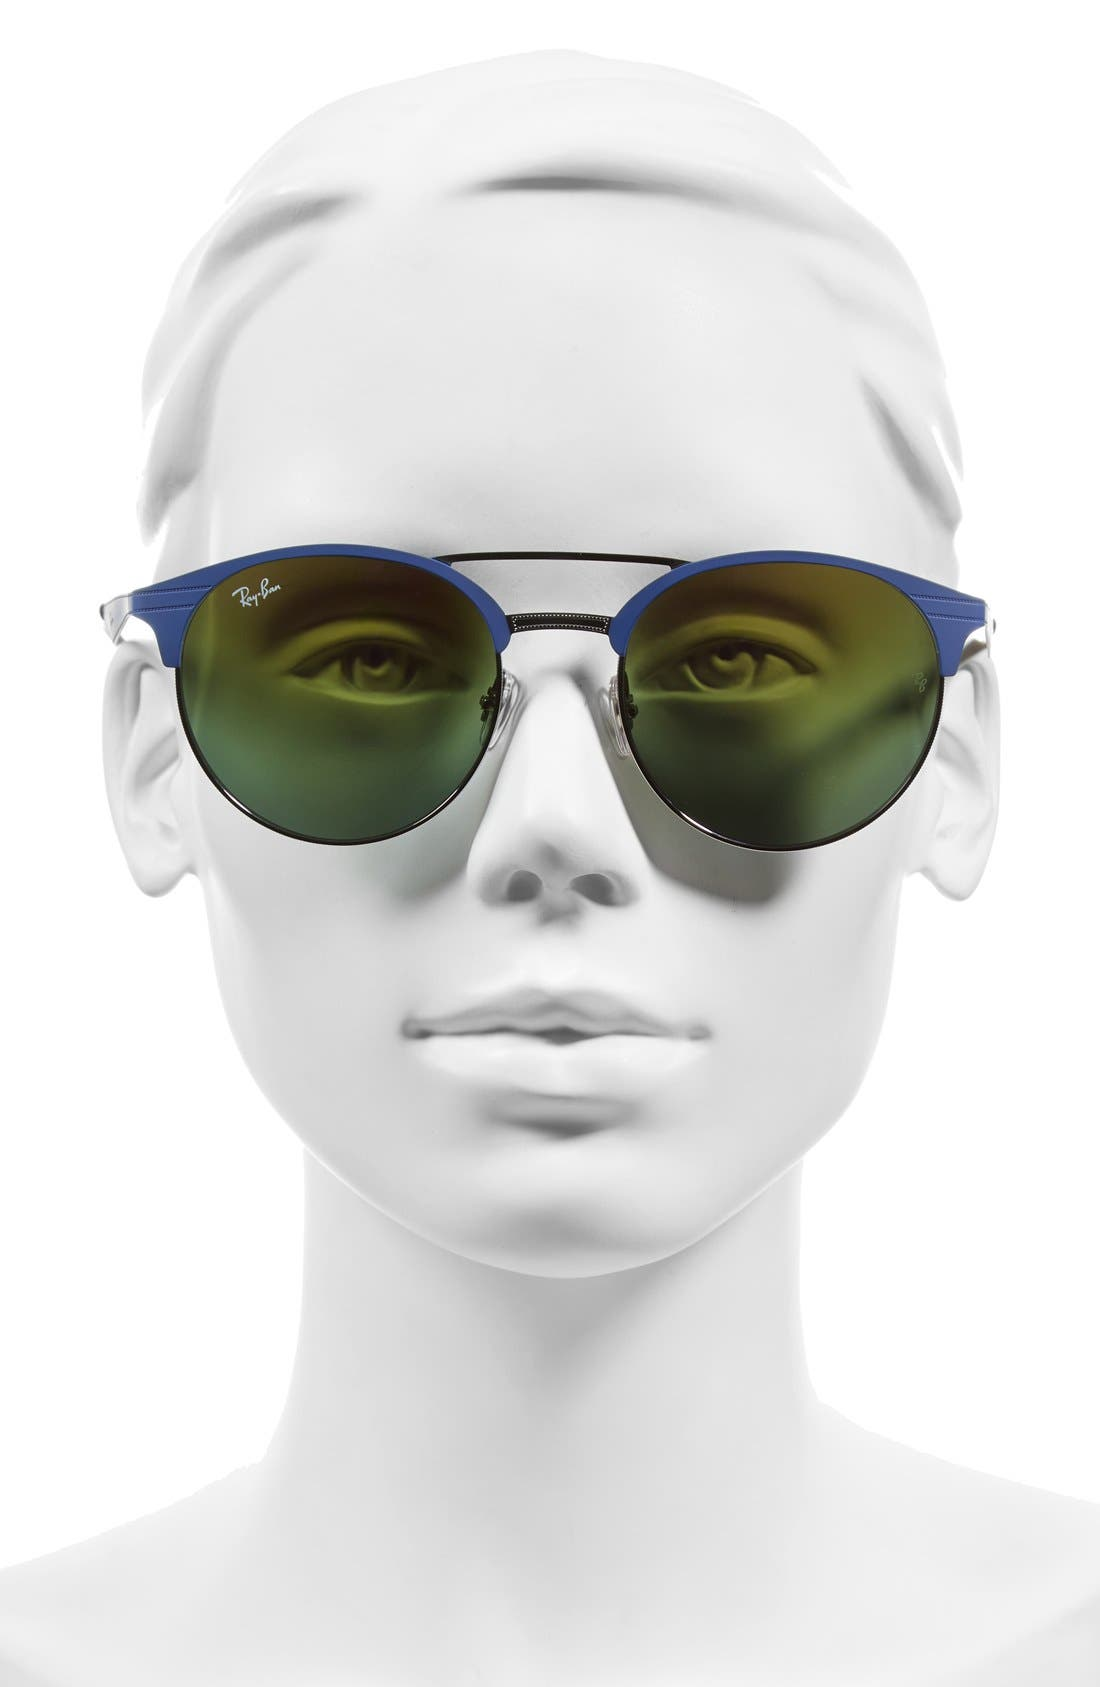 Highstreet 54mm Round Sunglasses,                             Alternate thumbnail 2, color,                             001